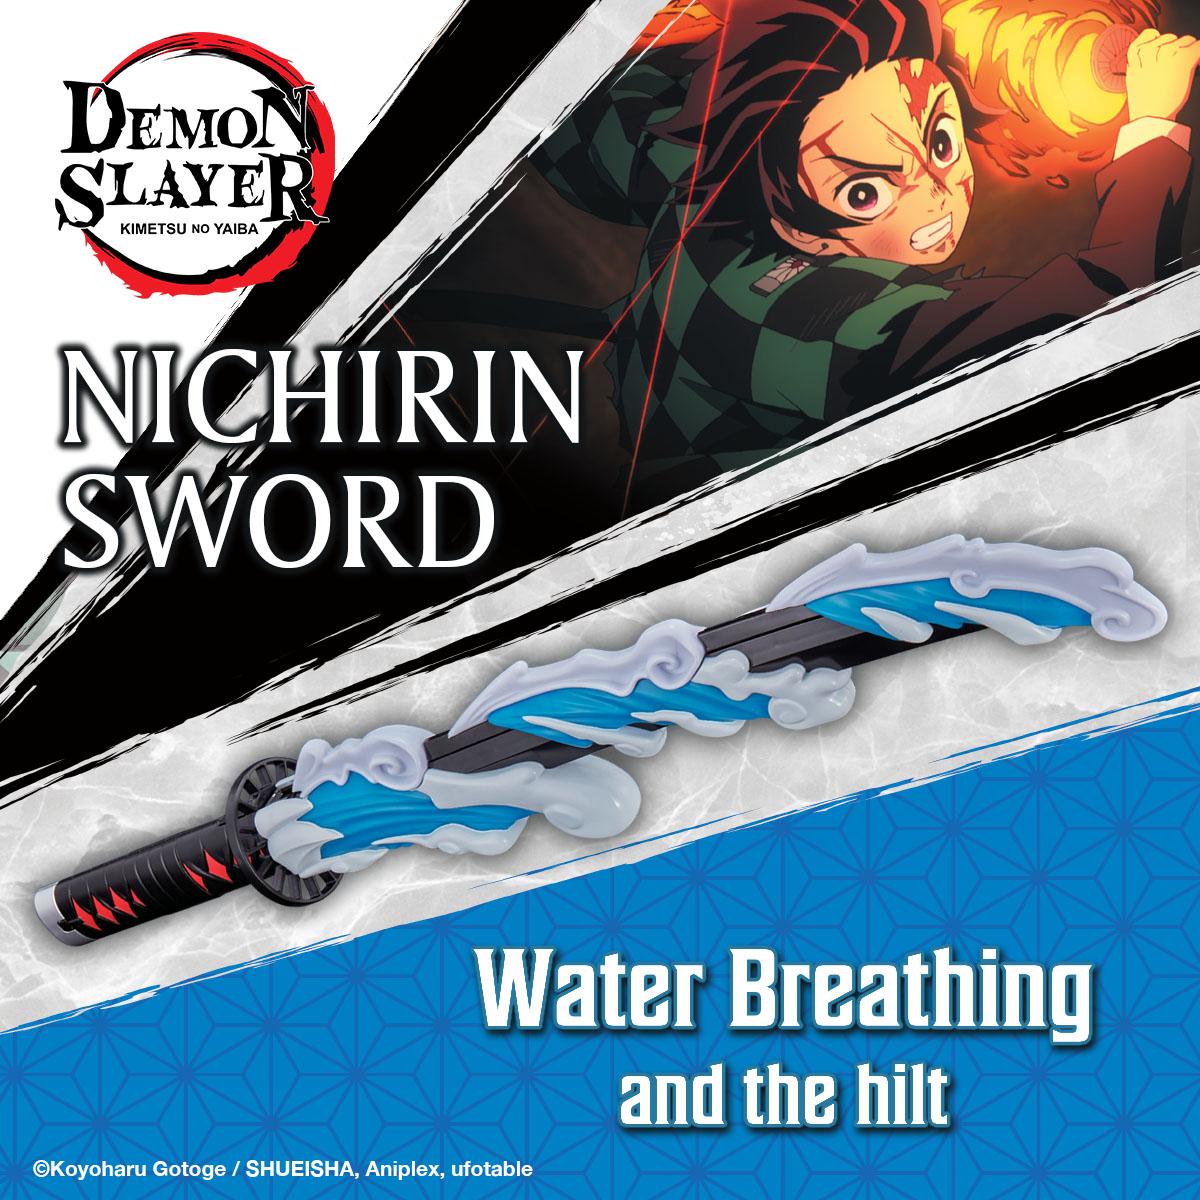 Demon Slayer DX Nichirin Sword